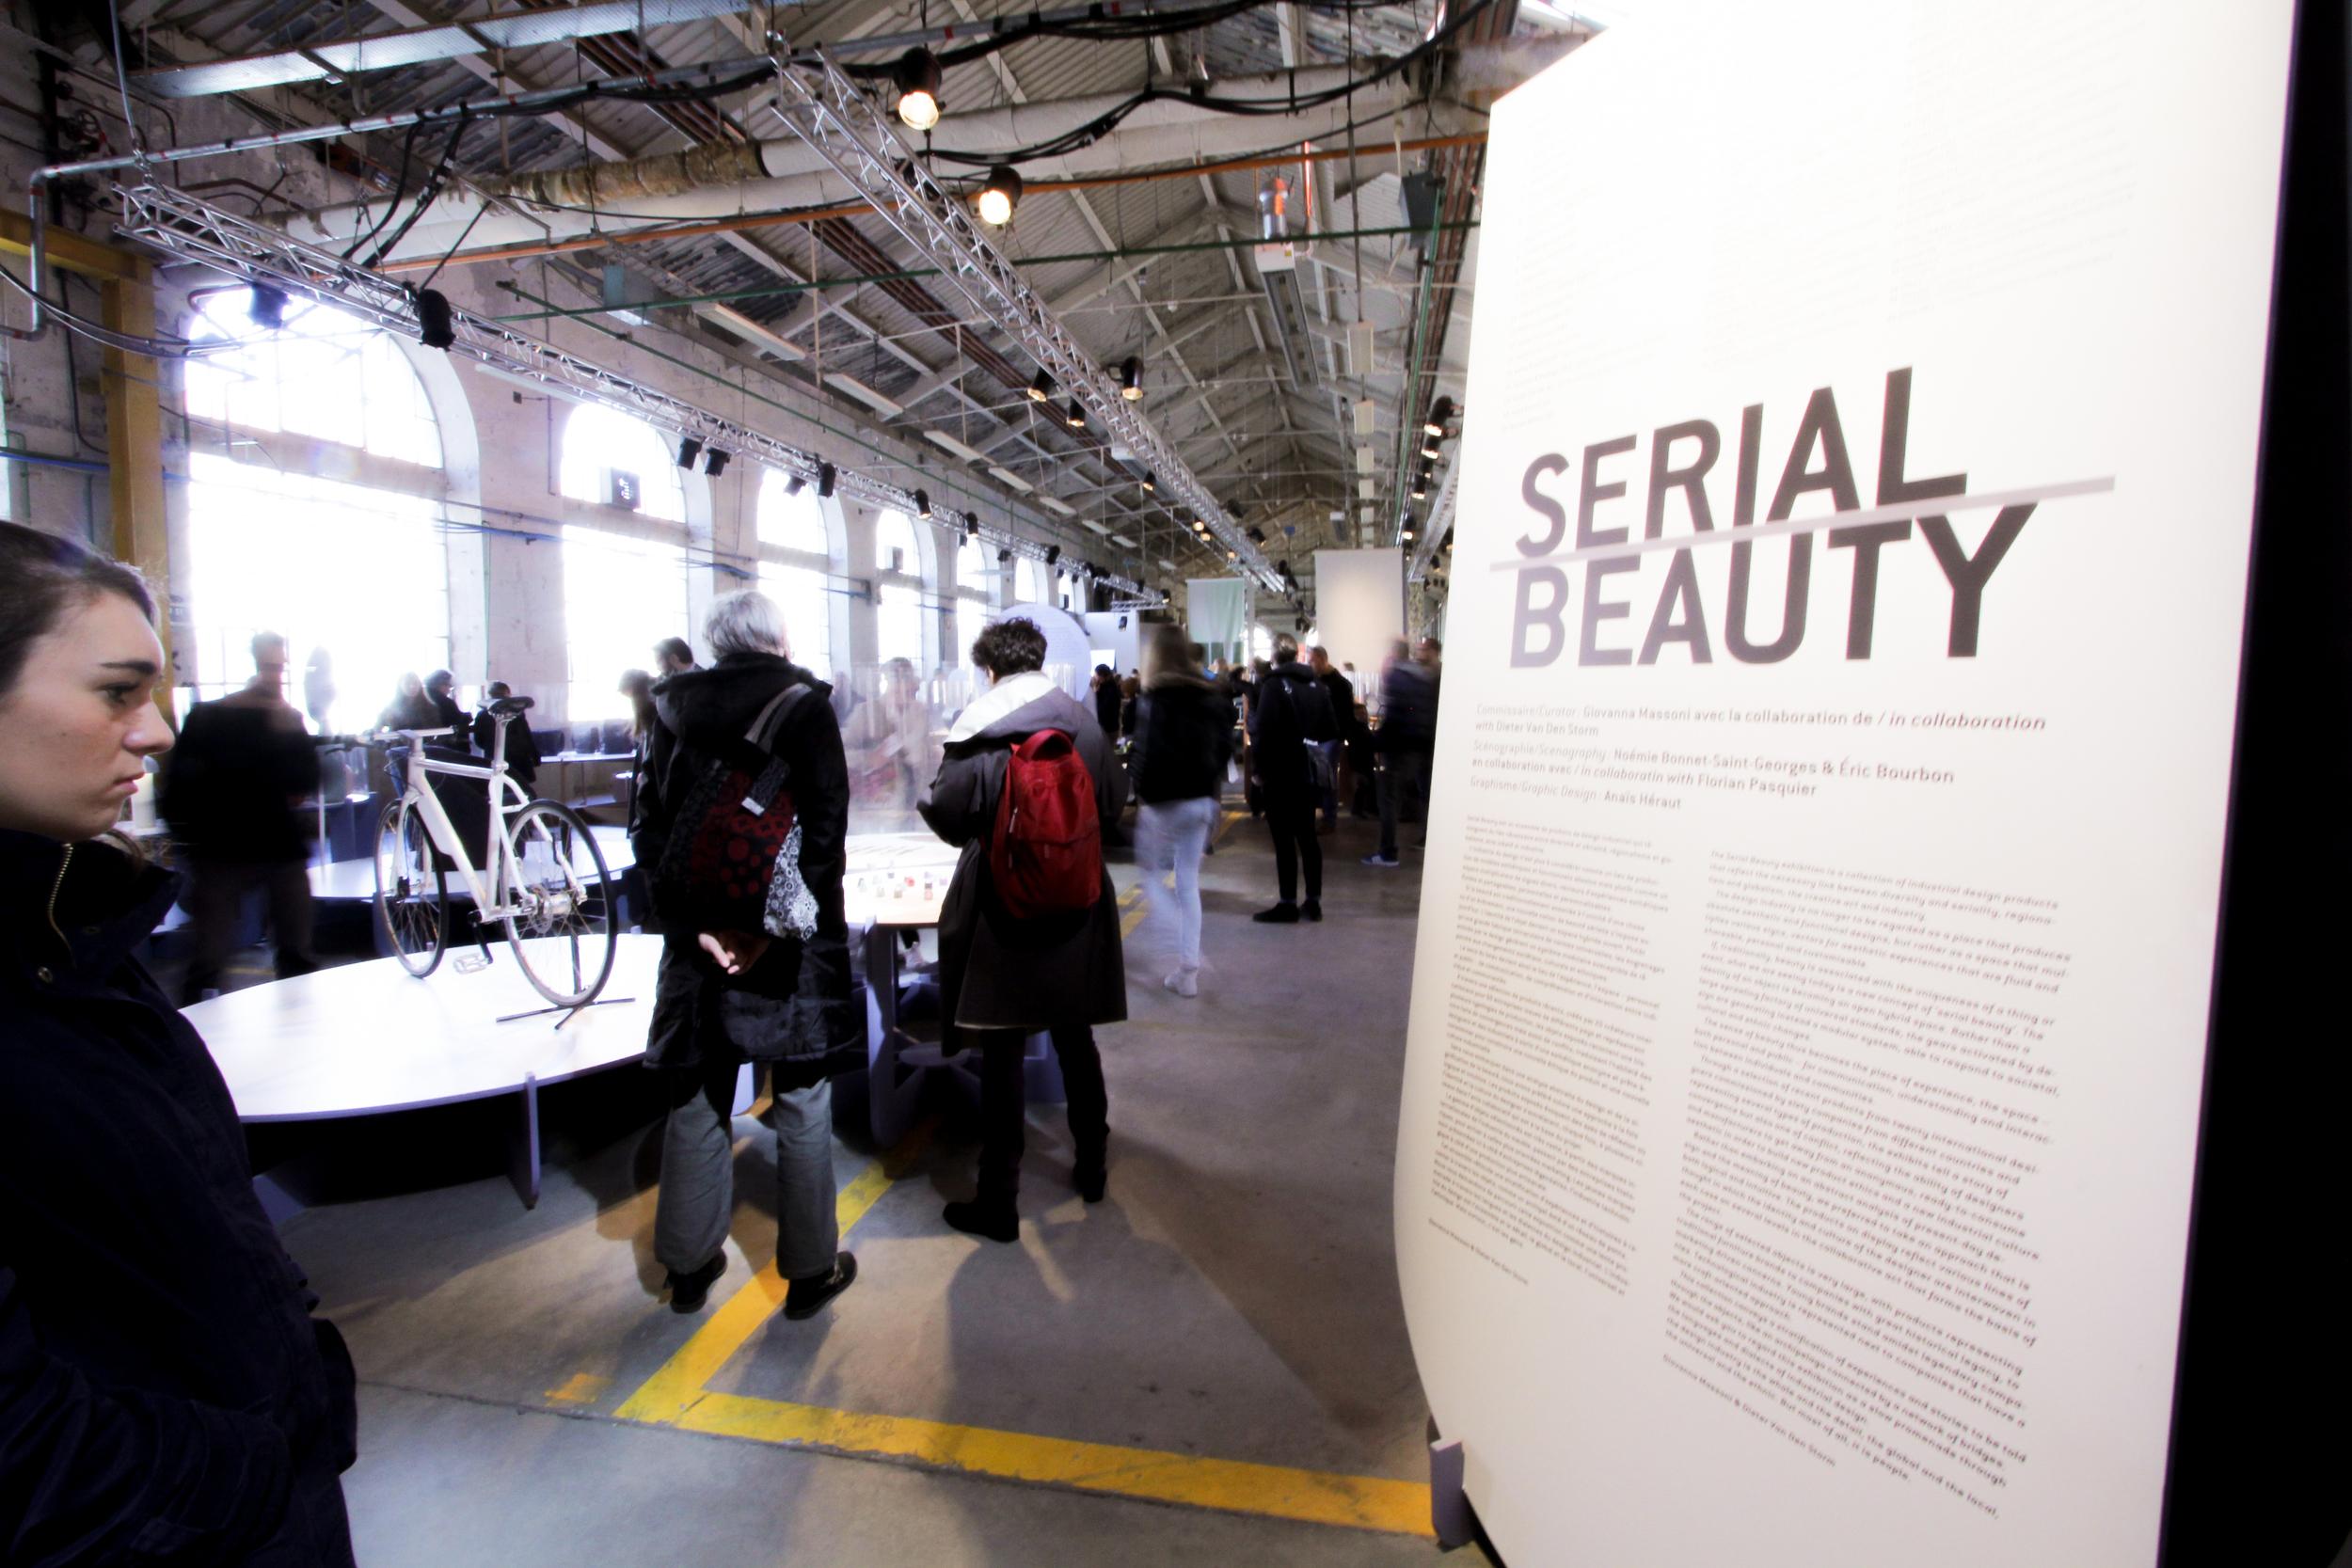 Serial Beauty. Cité du Design. image ©futurecrafter